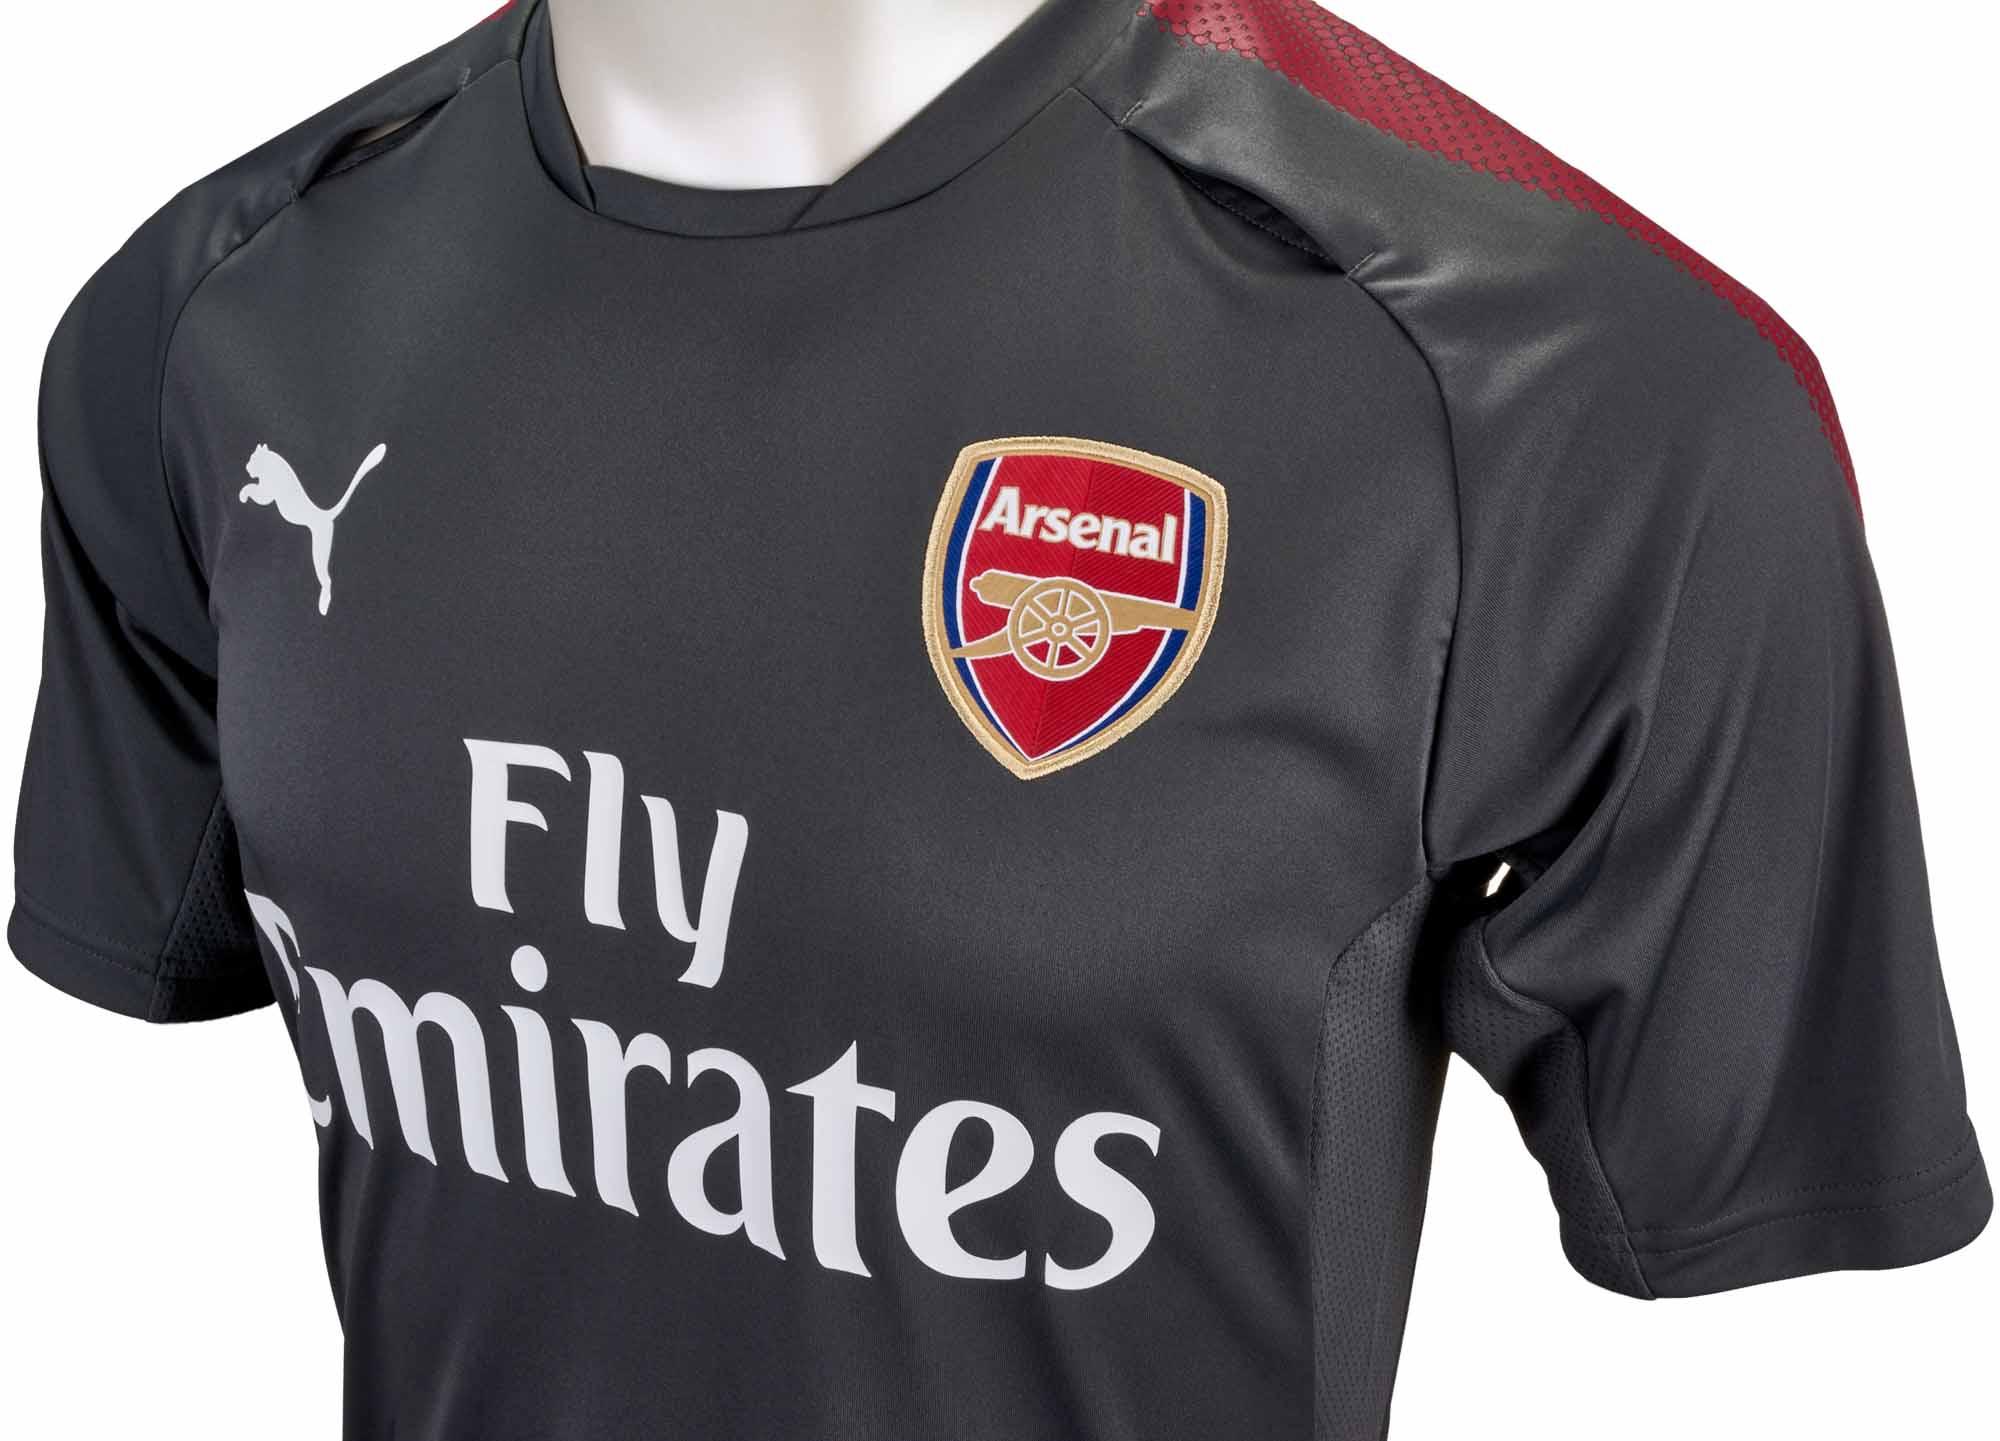 Puma Arsenal Training Jersey - Dark Shadow - Soccer Master aecc2097c